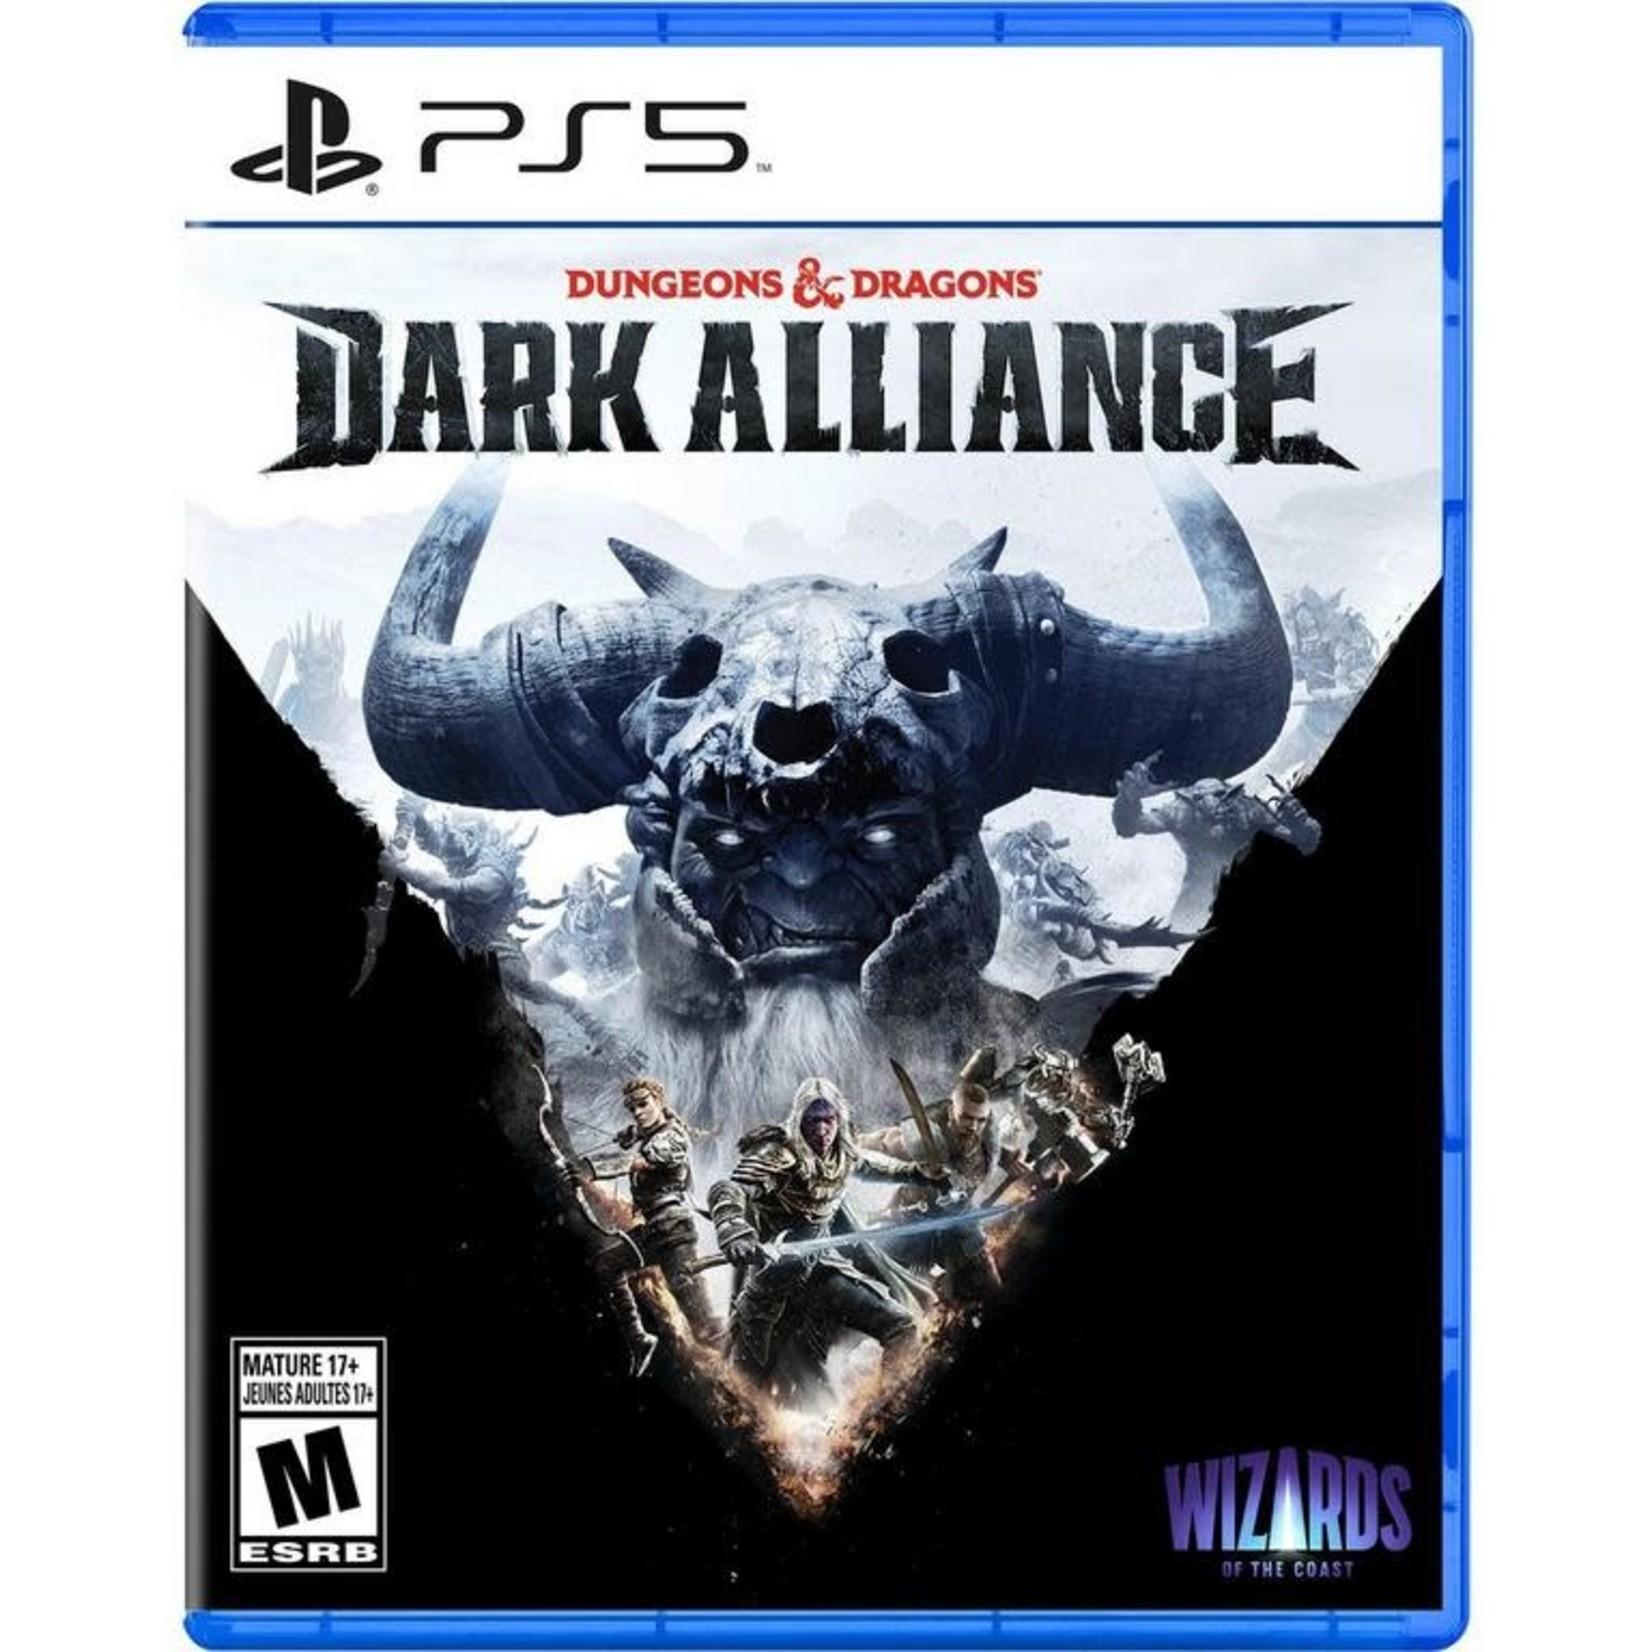 ps5u-Dungeons and Dragons Dark Alliance